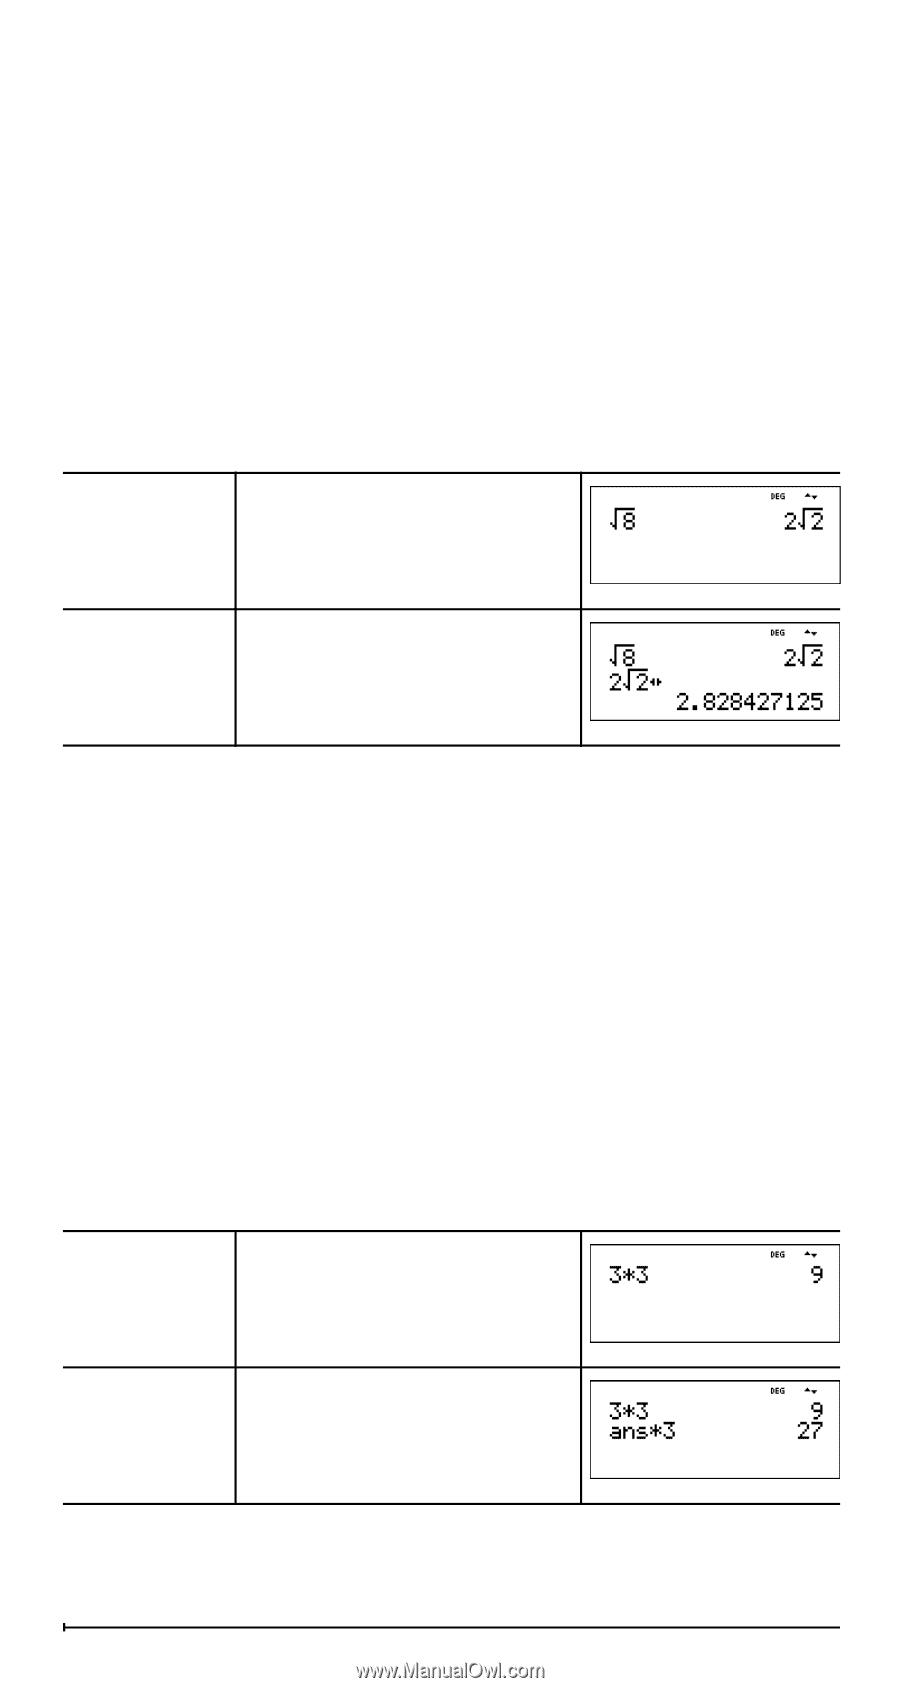 Texas Instruments TI-36X Pro | User Manual